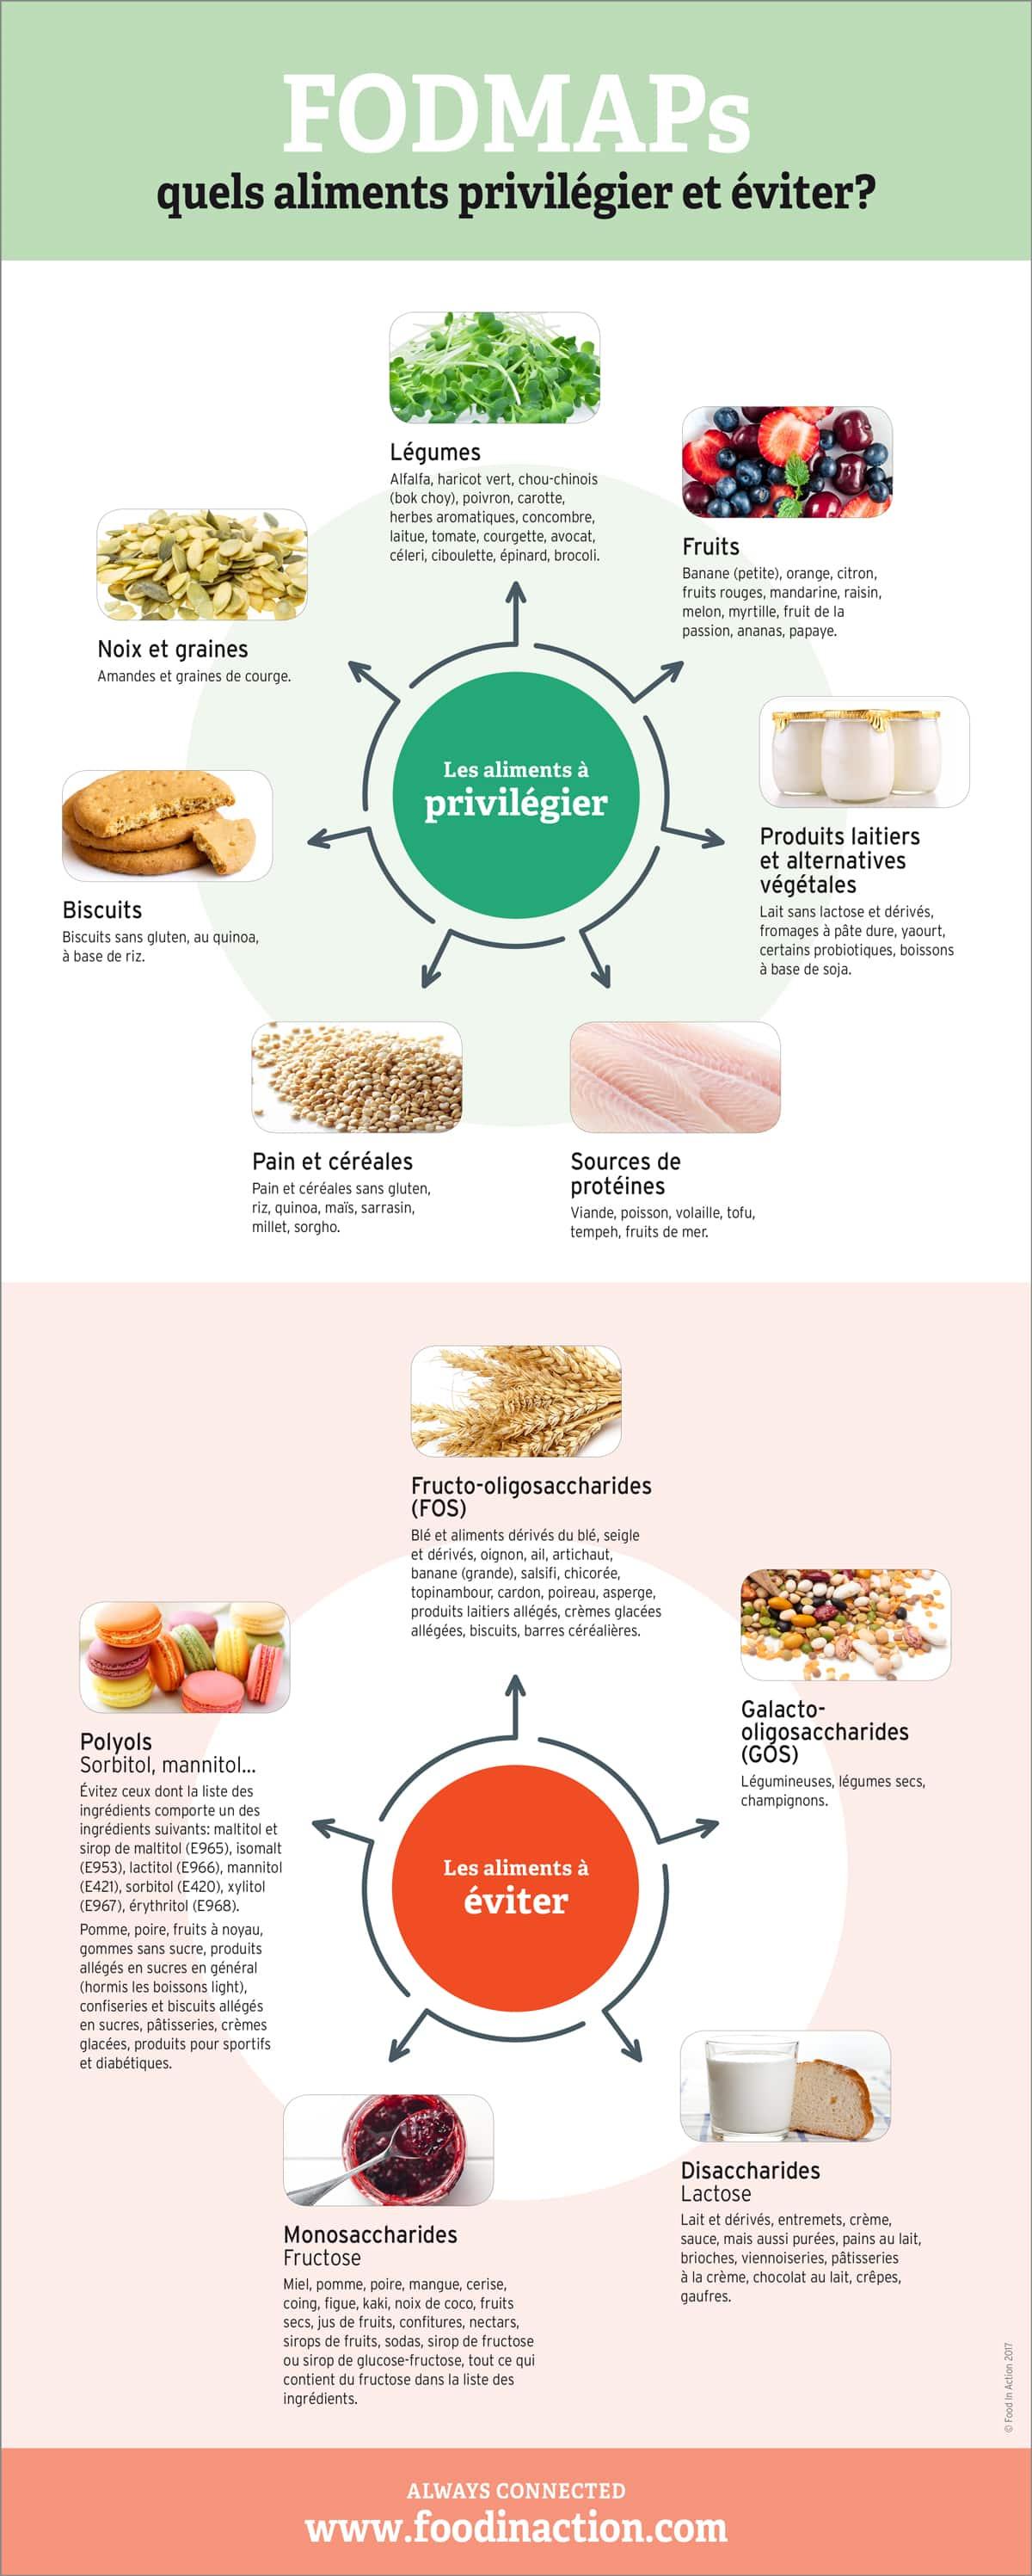 nutrigraphics-fodmaps-aliments